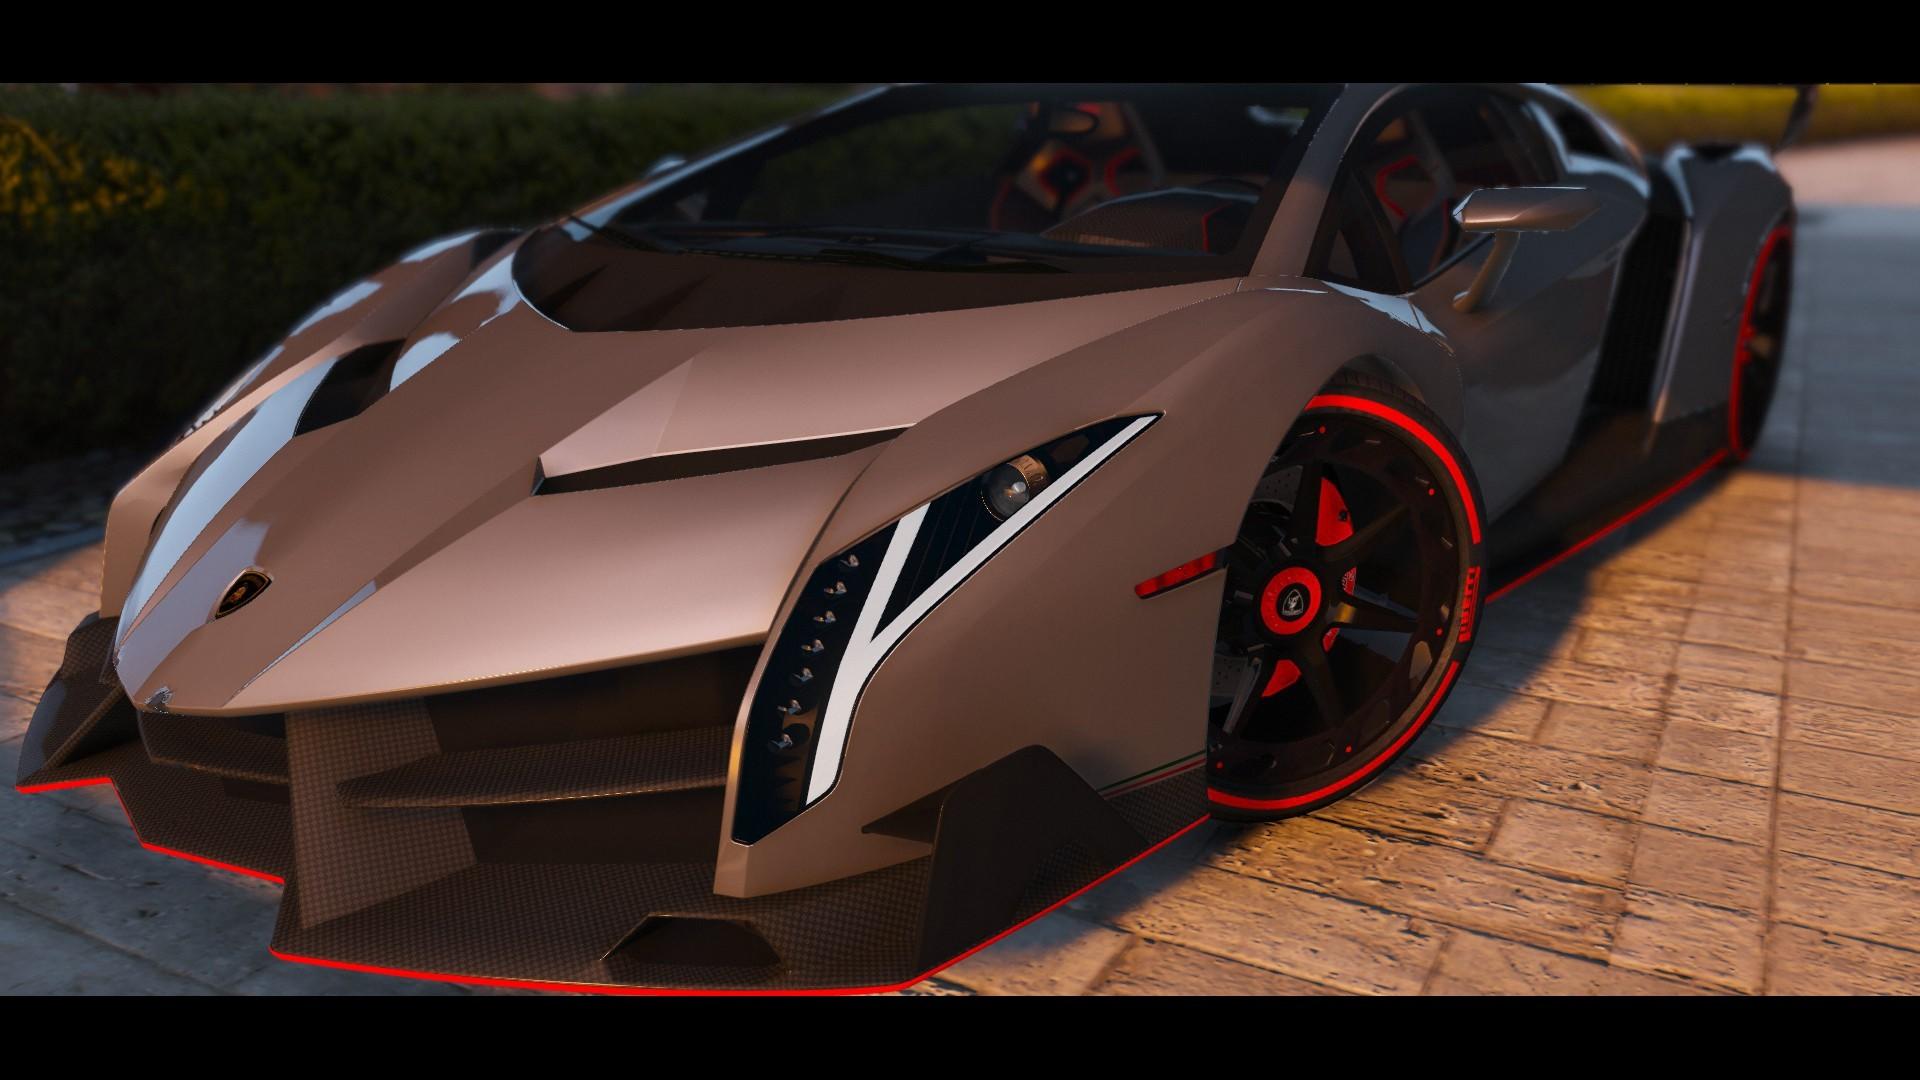 Lamborghini Veneno HQ [Add-On | Dials] - Car Hot - 9gta5mods com